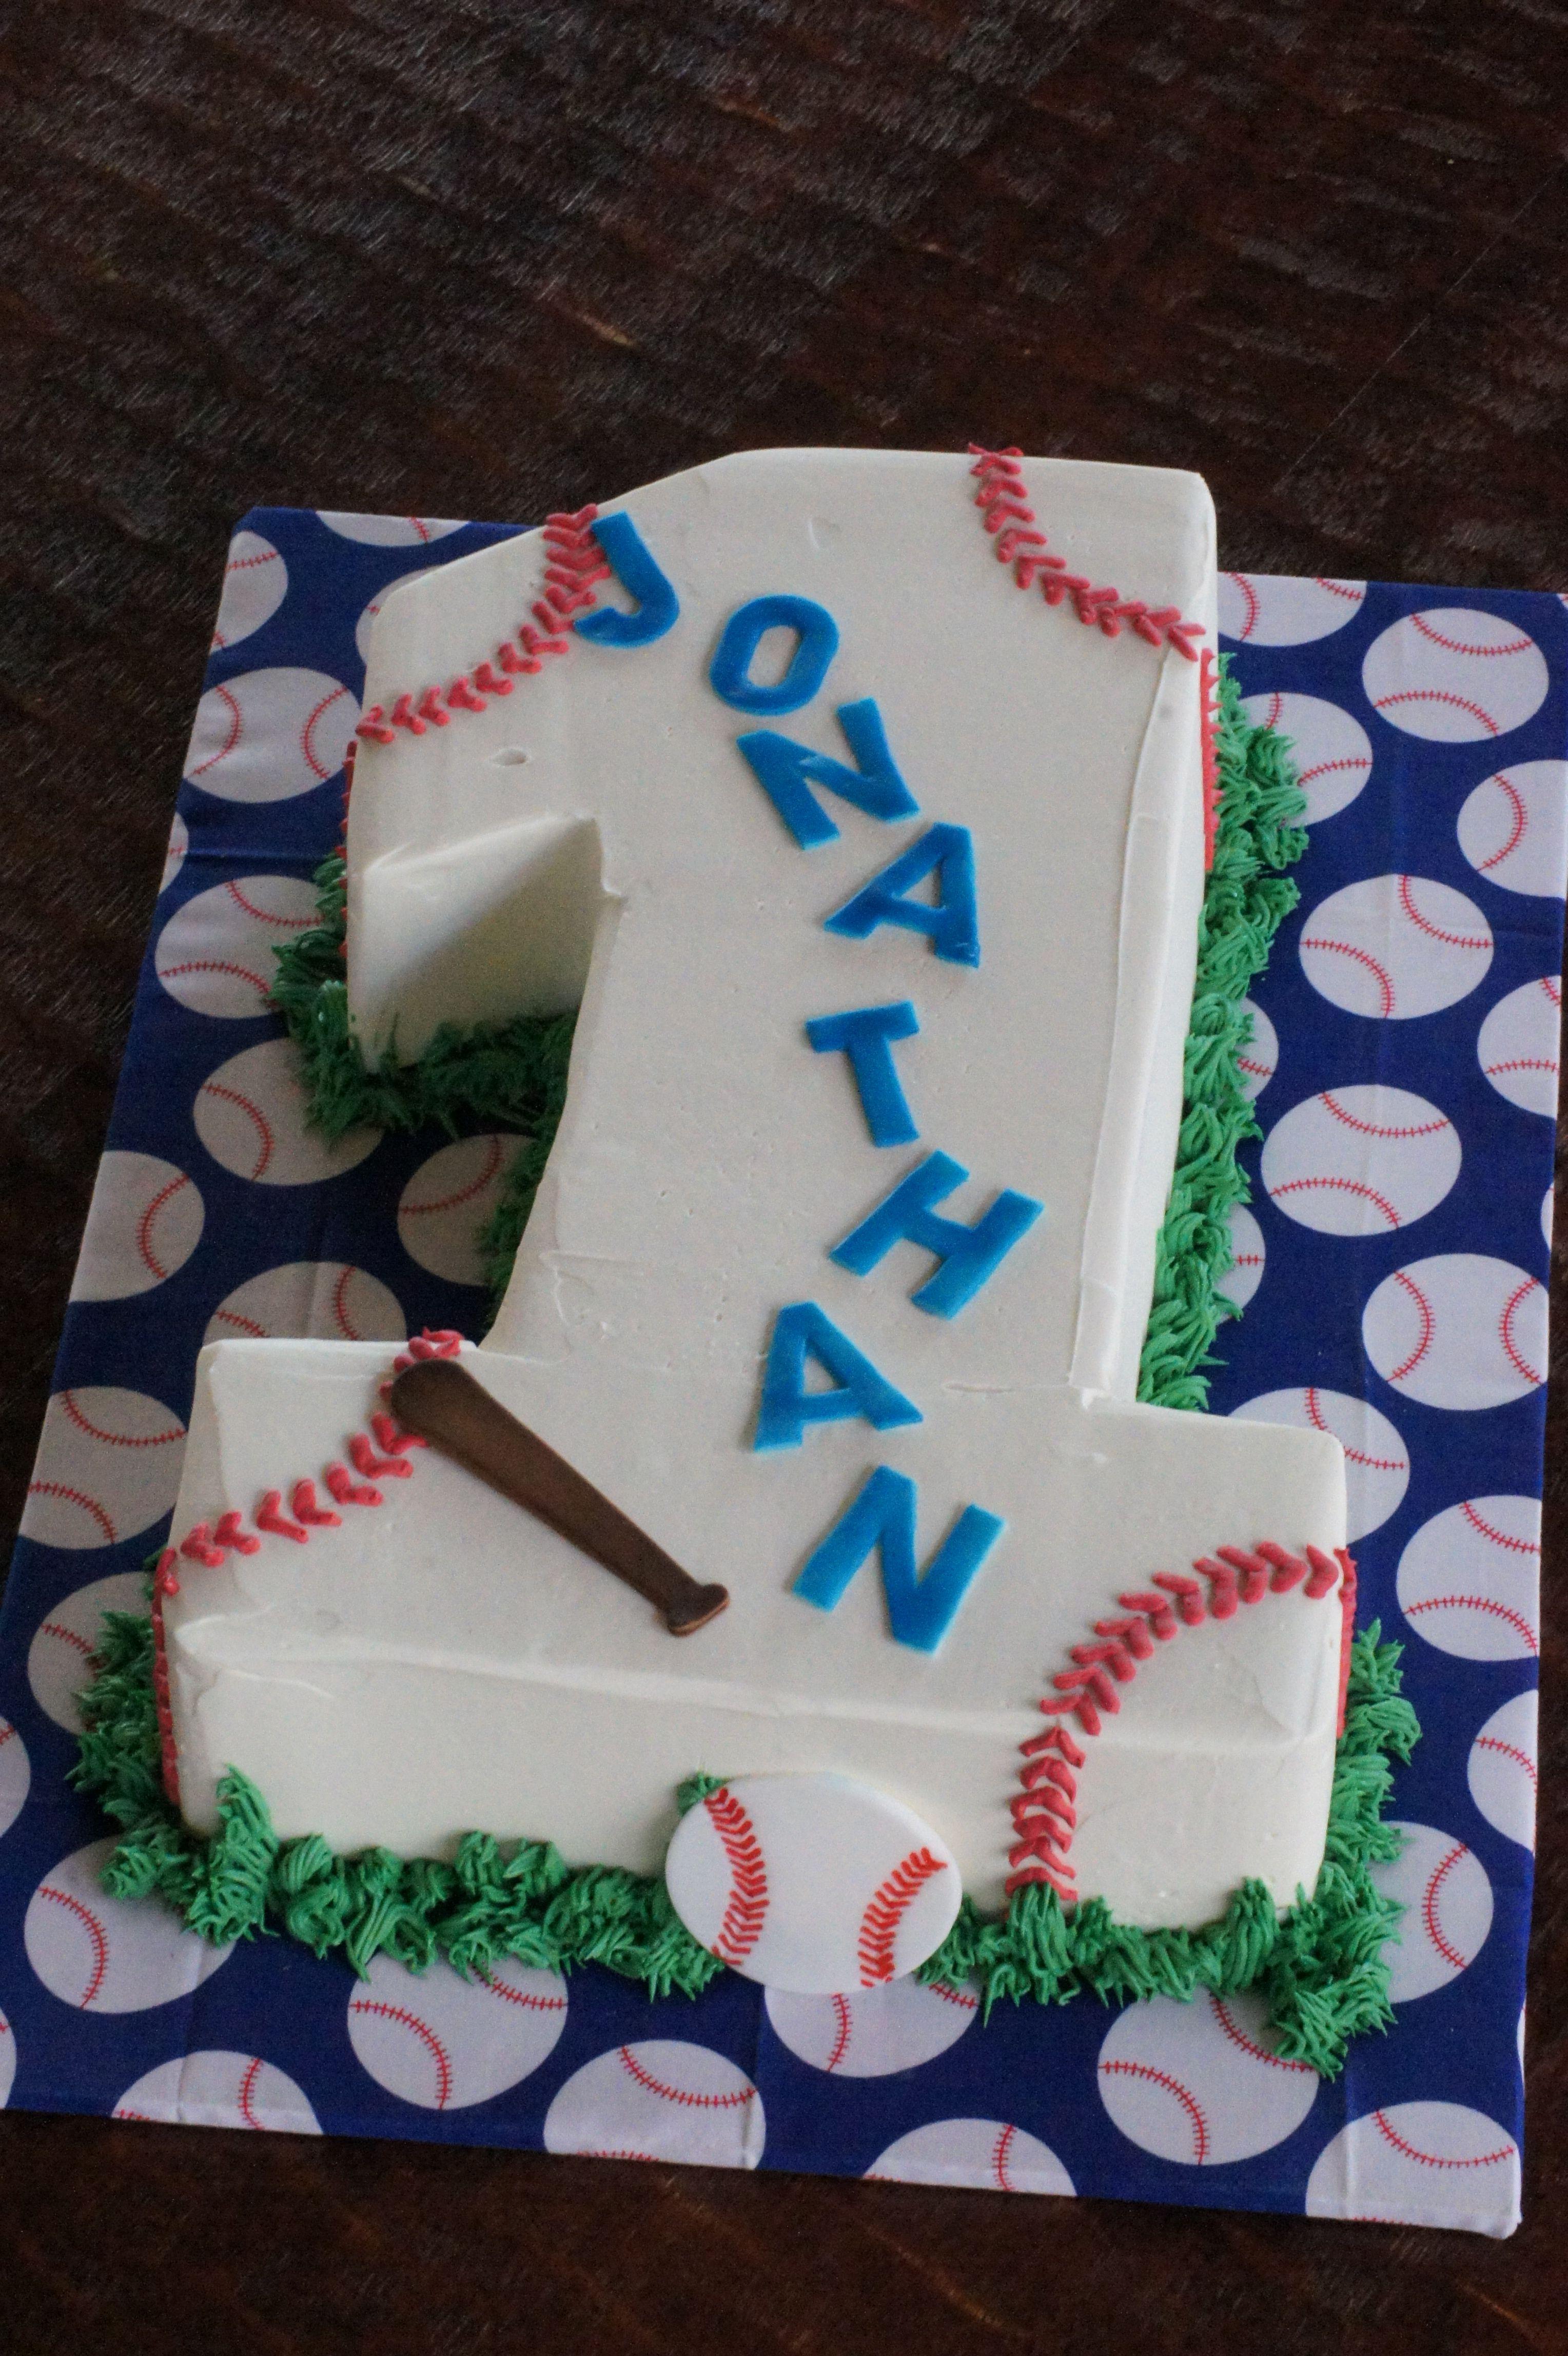 Number 1 Shaped Birthday Cake With Baseball Theme